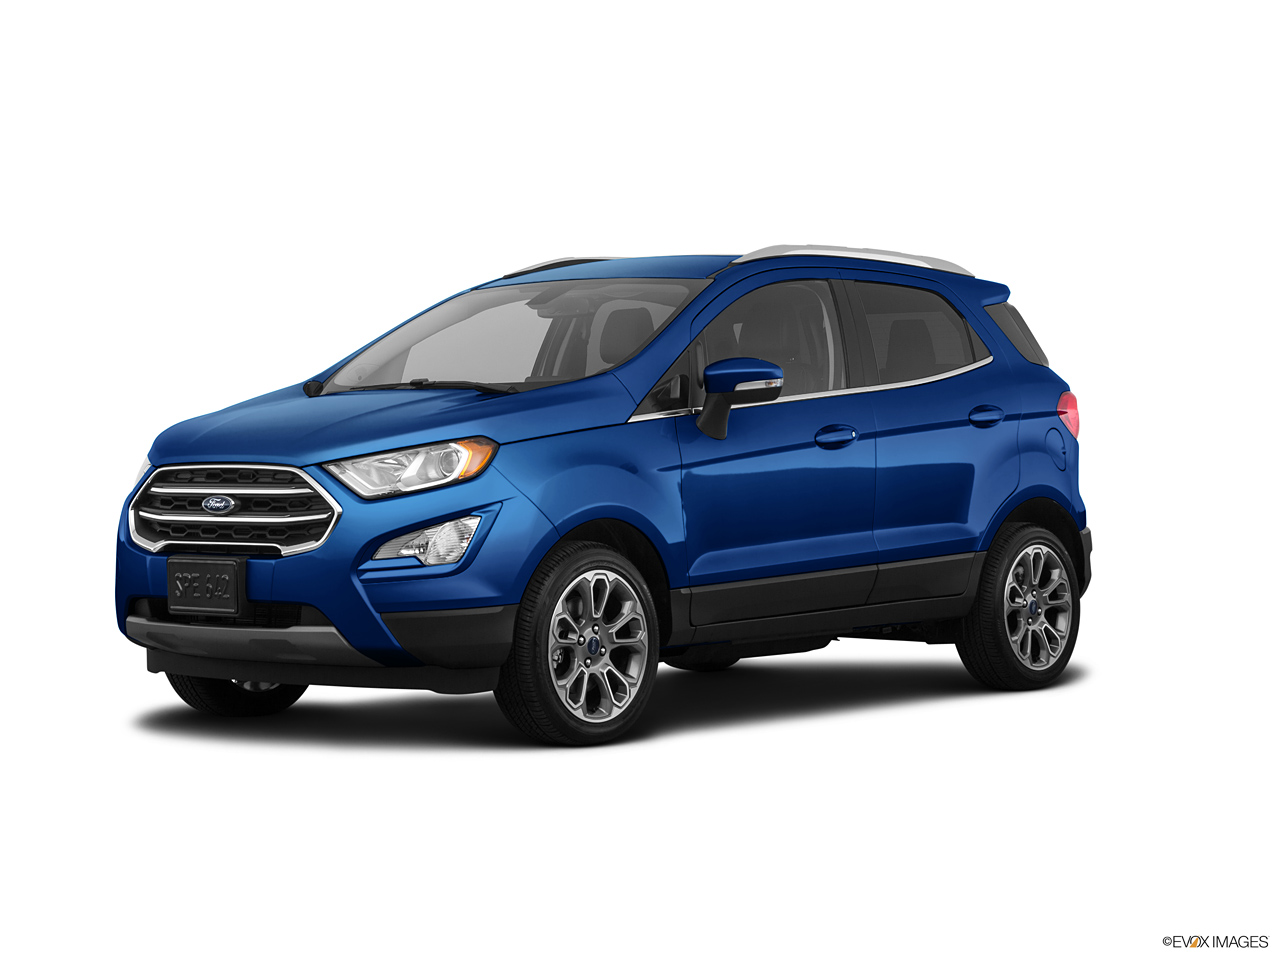 Image Result For Ford Ecosport Kuwait